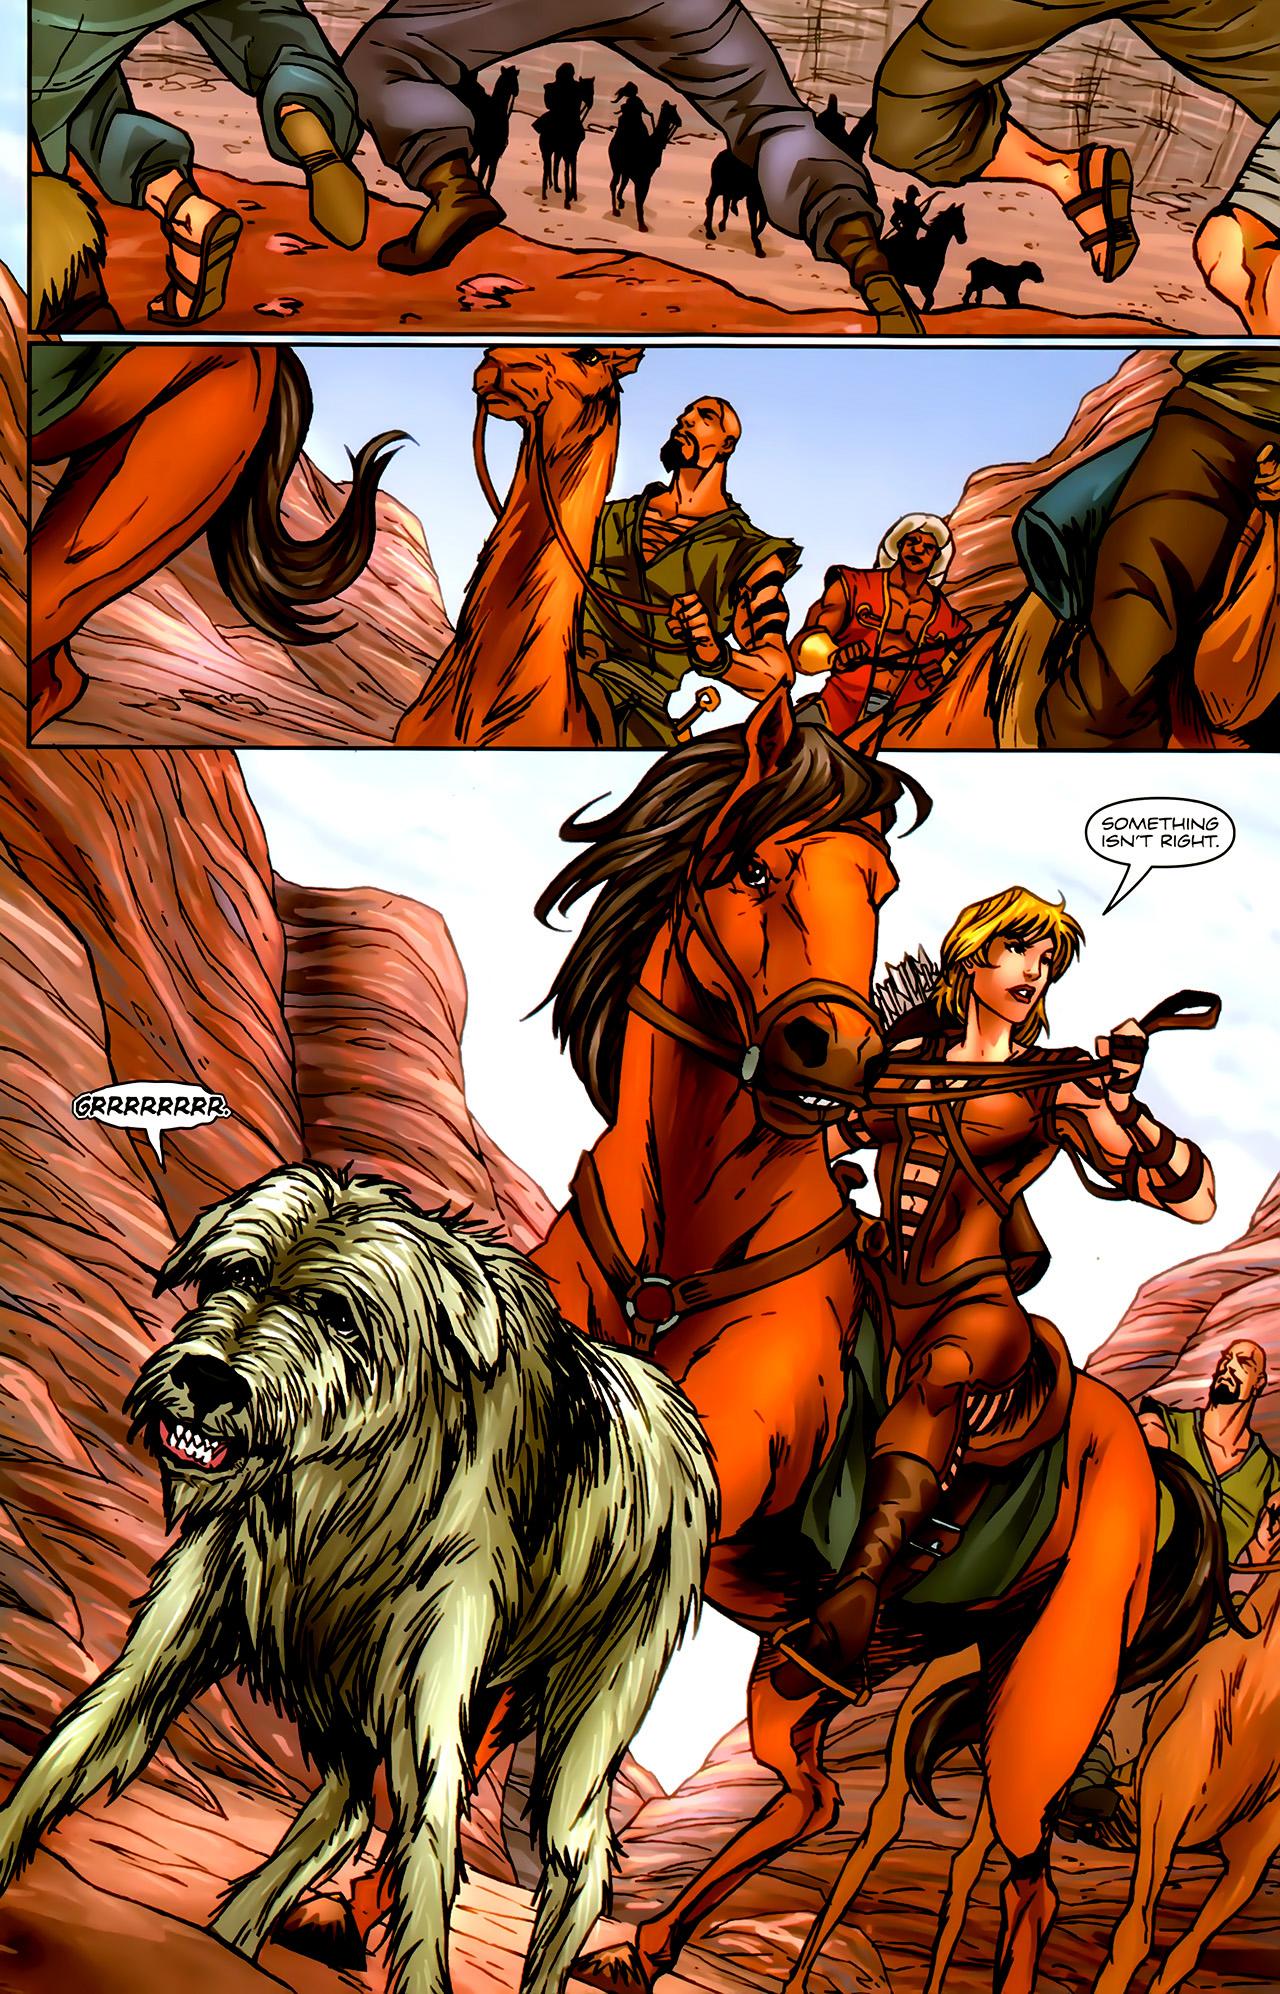 Read online 1001 Arabian Nights: The Adventures of Sinbad comic -  Issue #9 - 14